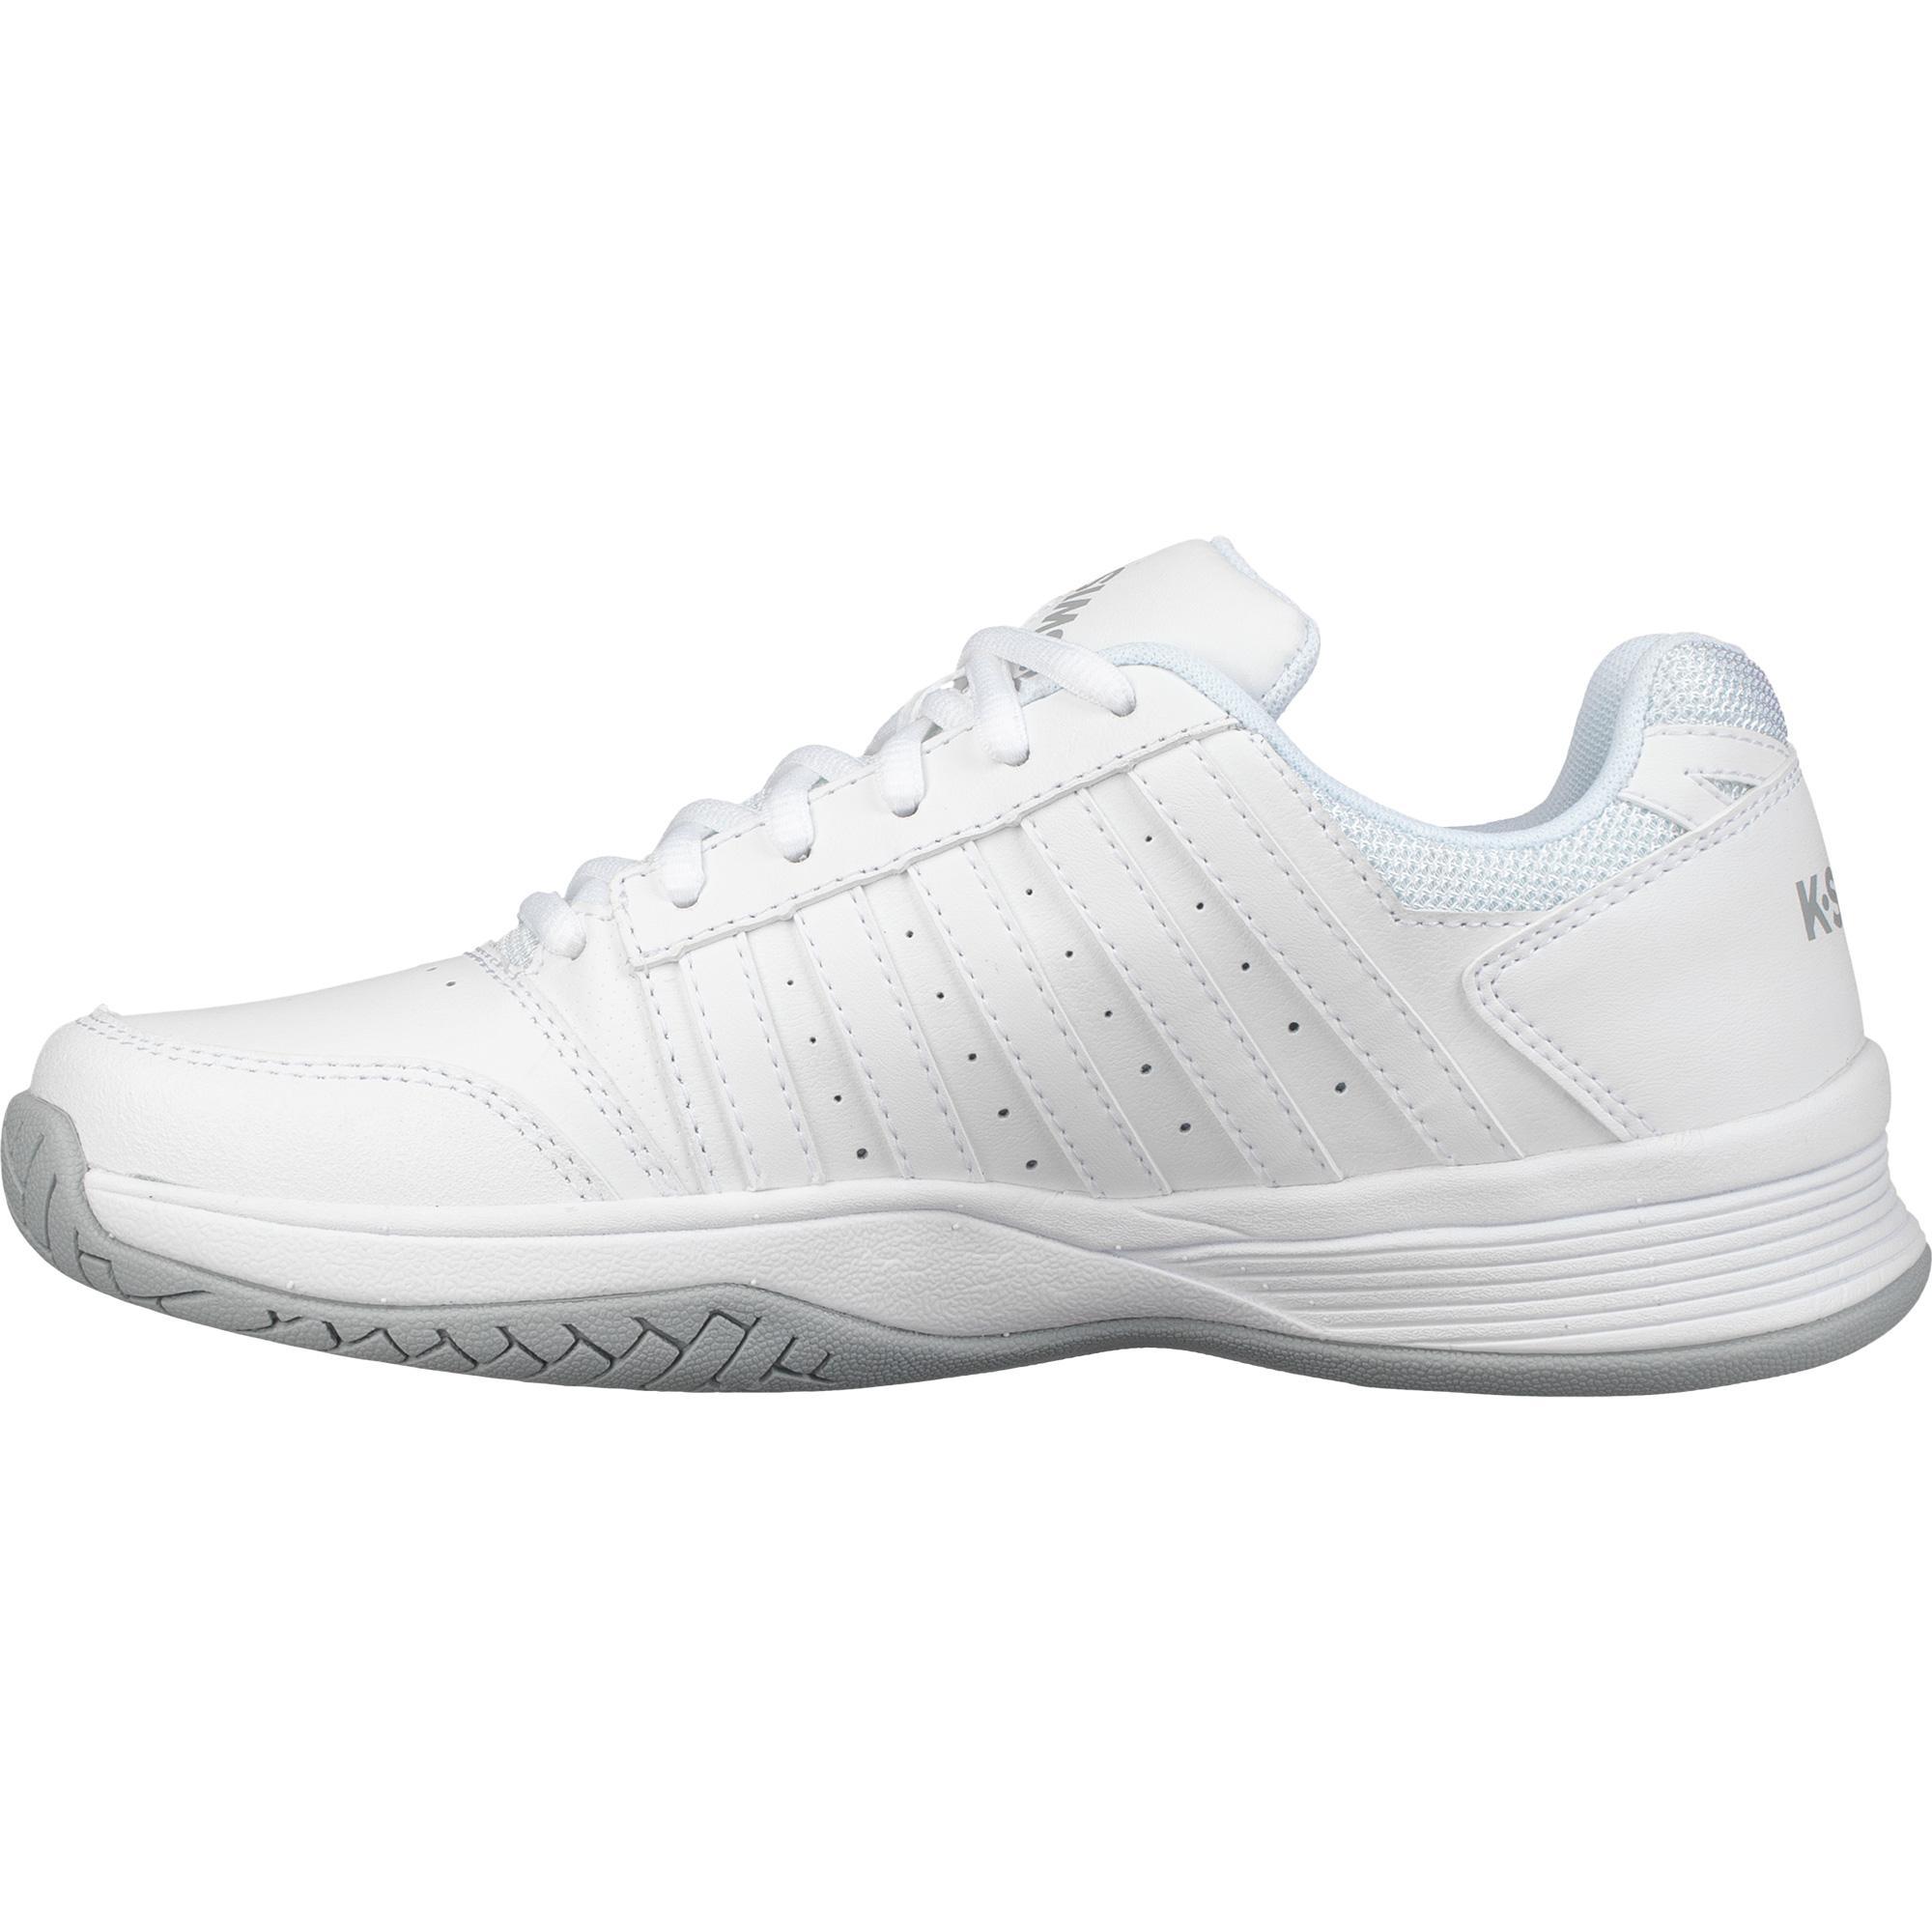 2d0bb6fa82936 K-Swiss Womens Court Smash Tennis Shoes - White/Highrise